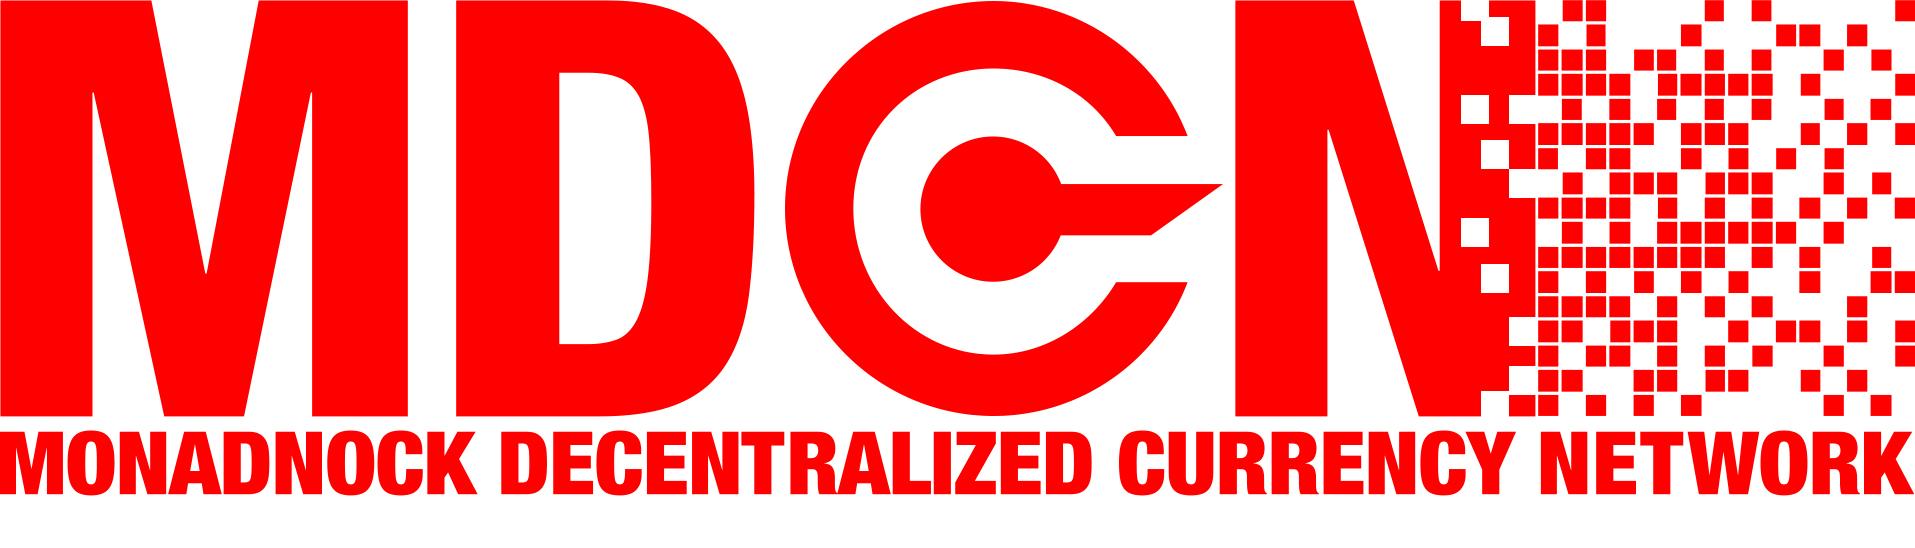 MDCN ICO Alert, ICO Calendar, ICO List